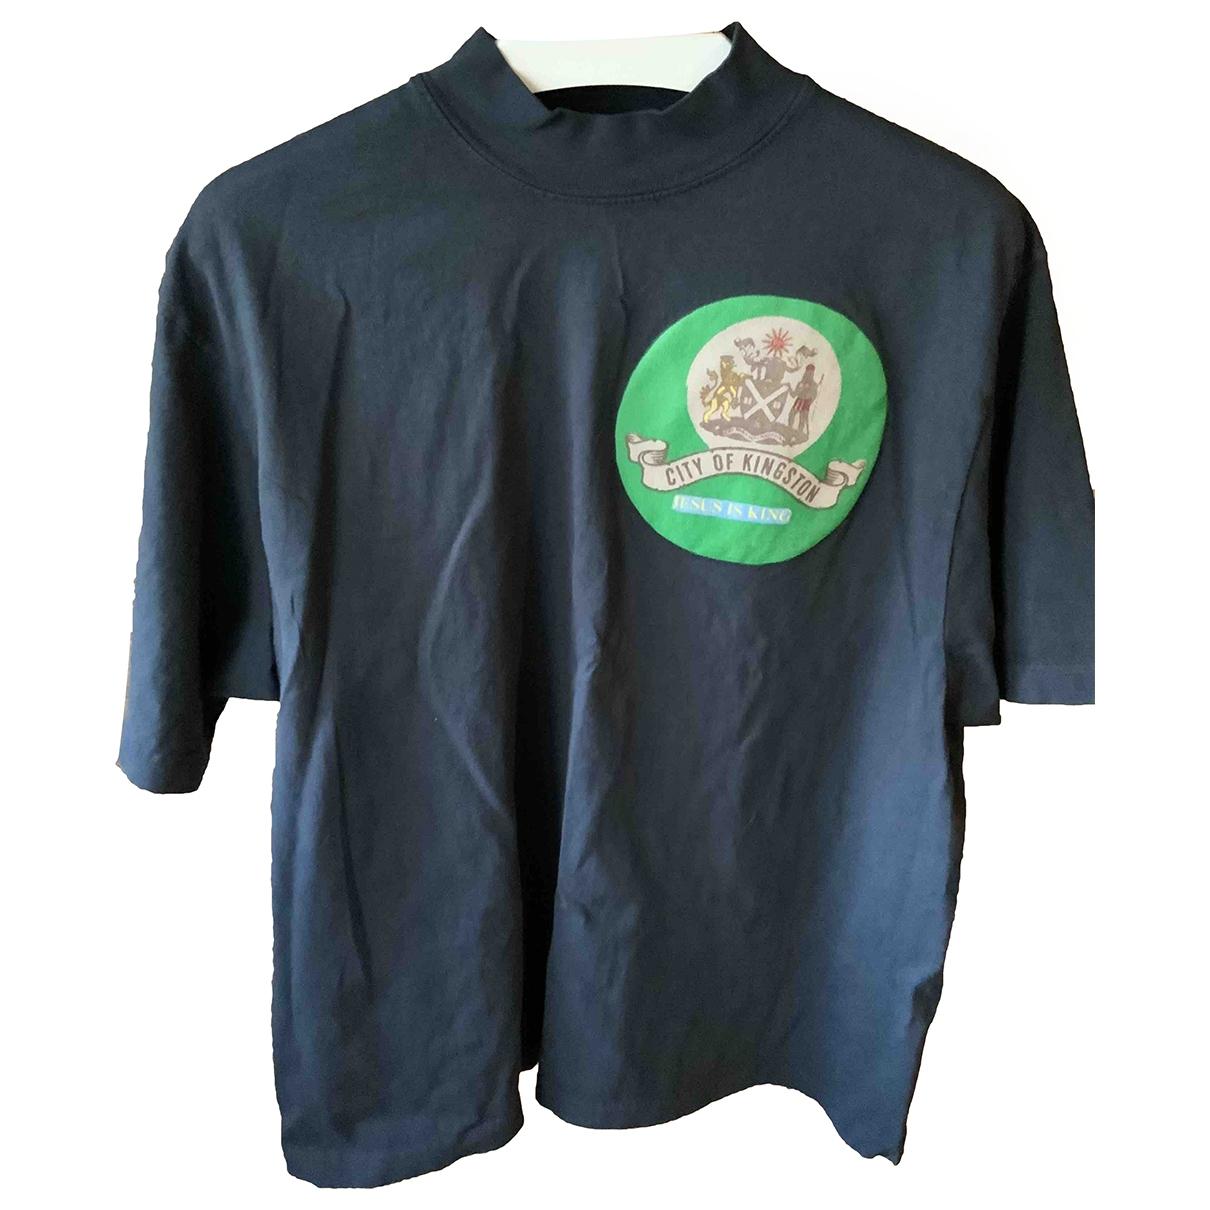 Yeezy \N Navy Cotton T-shirts for Men M International